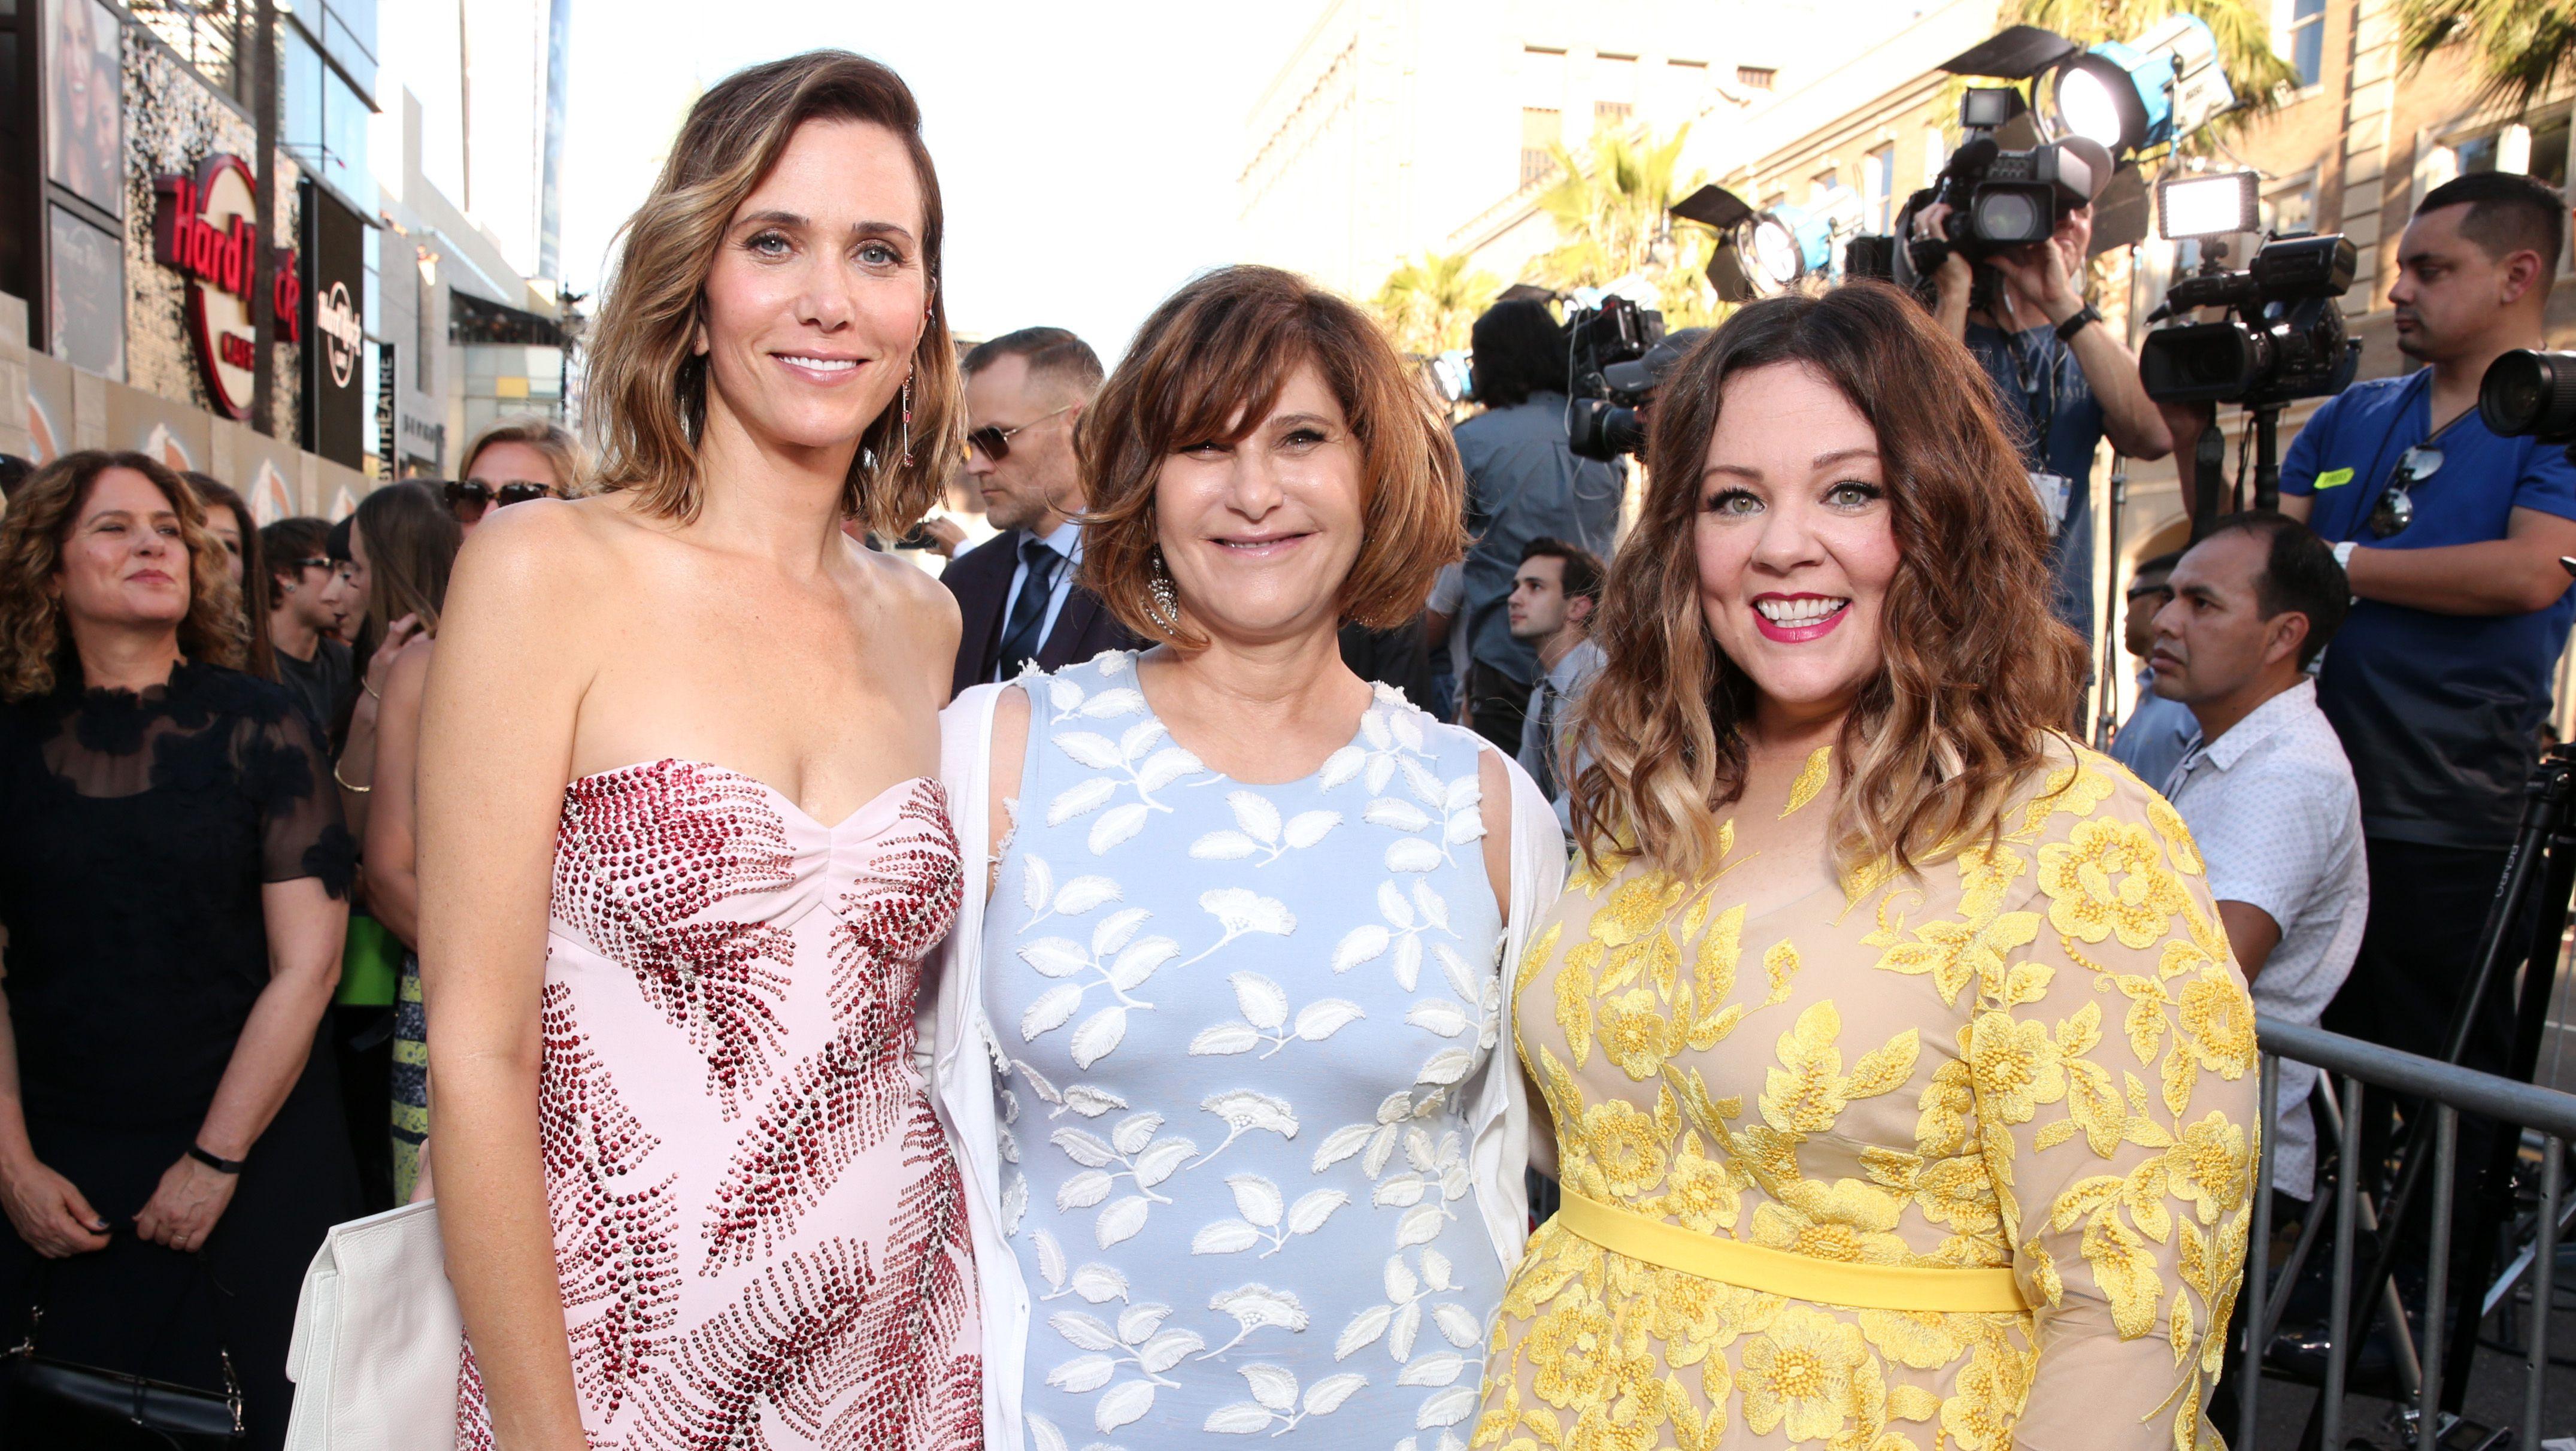 Pat Stevens,Eliza Clark (actress) Hot pic Micky Levy,Denise Poirier